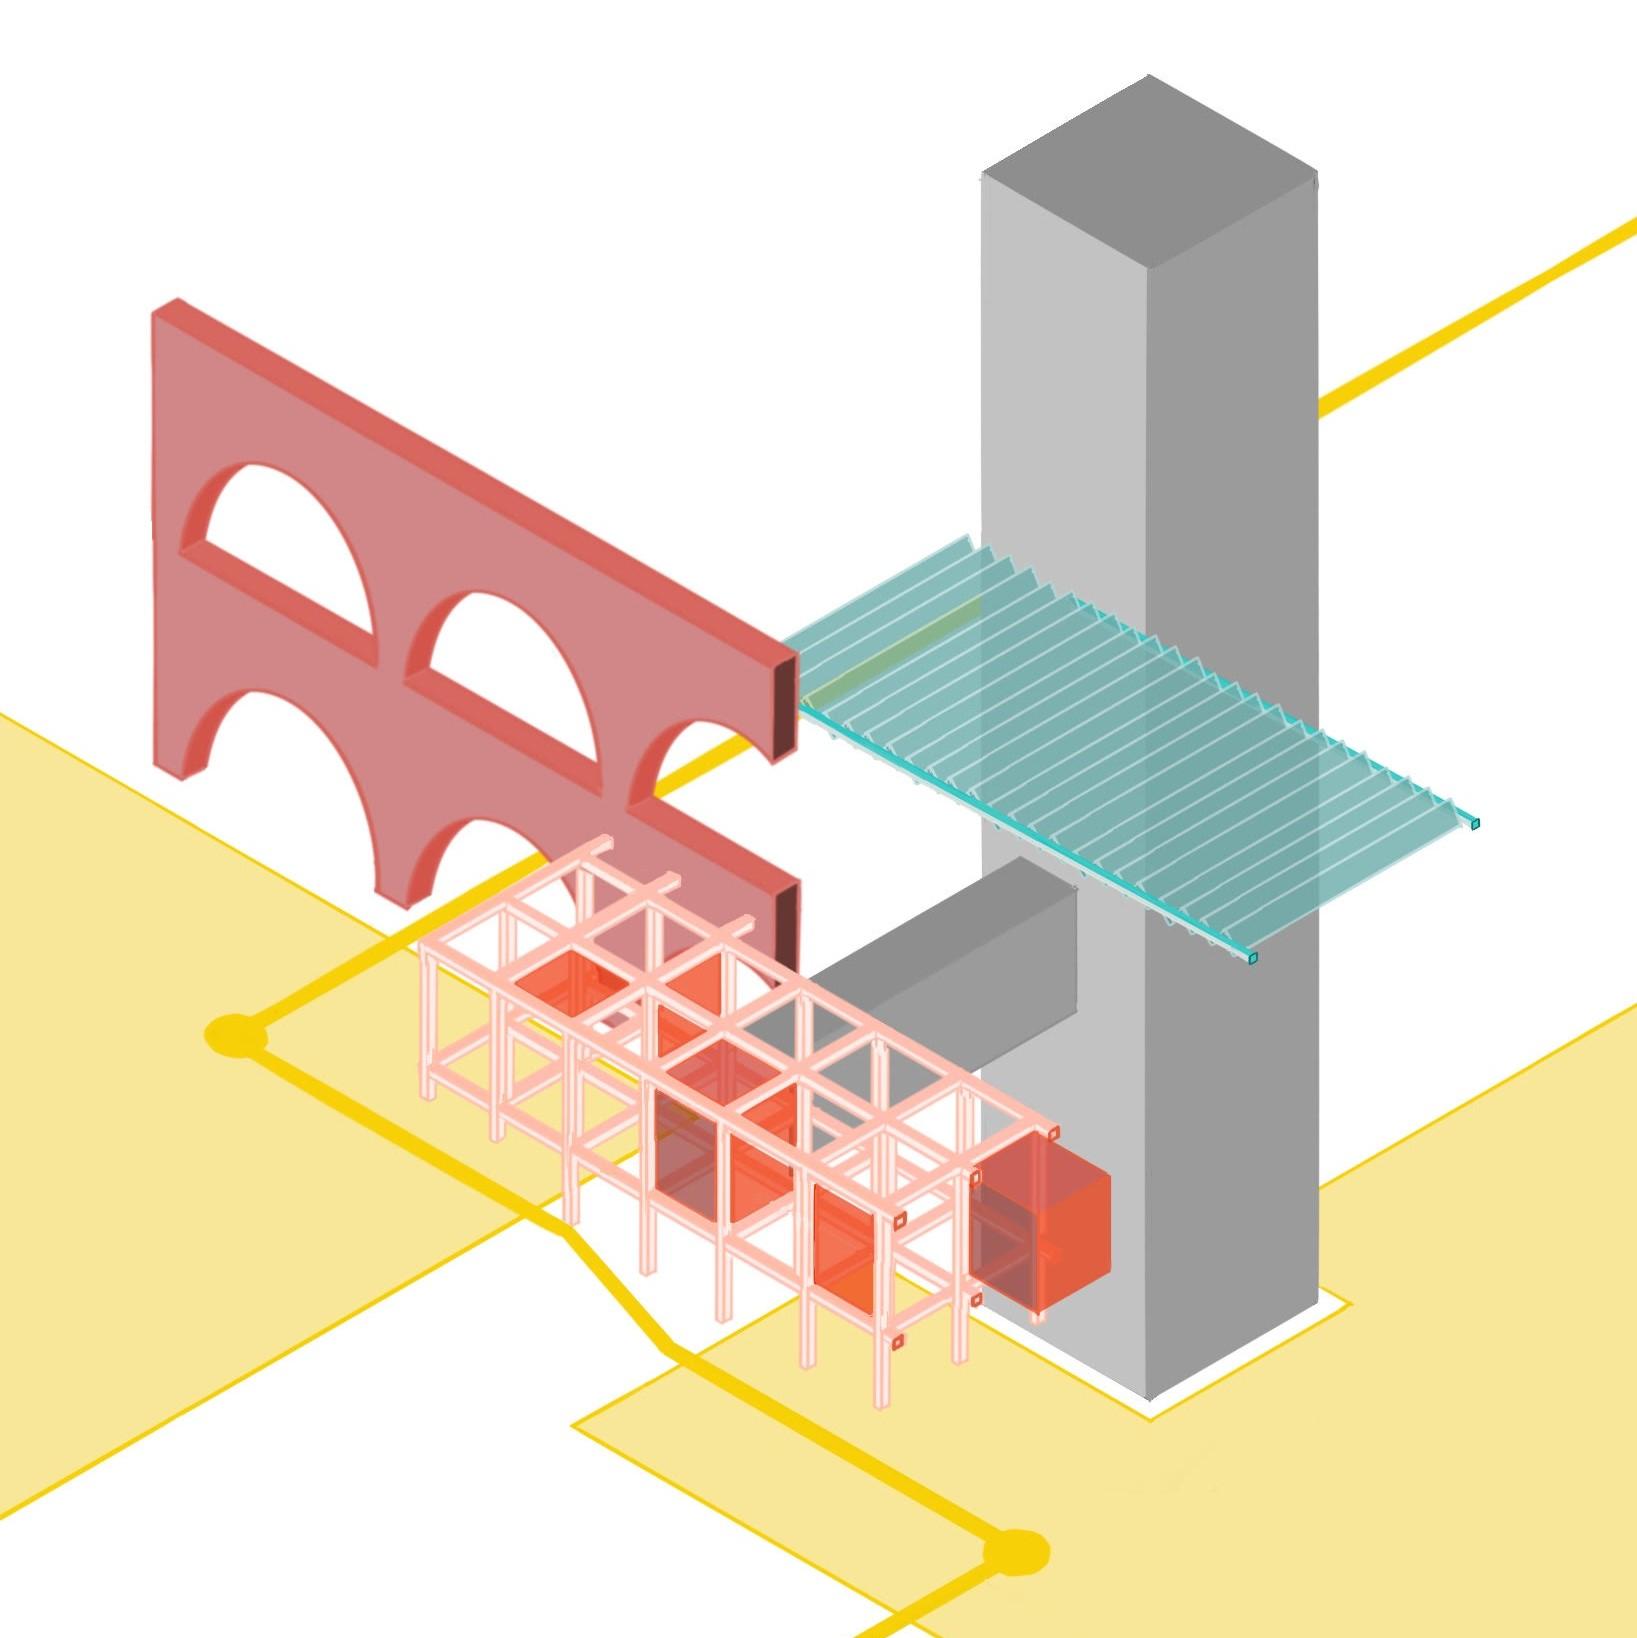 CITY, ephemeral : Dynamics of an Urban Insert